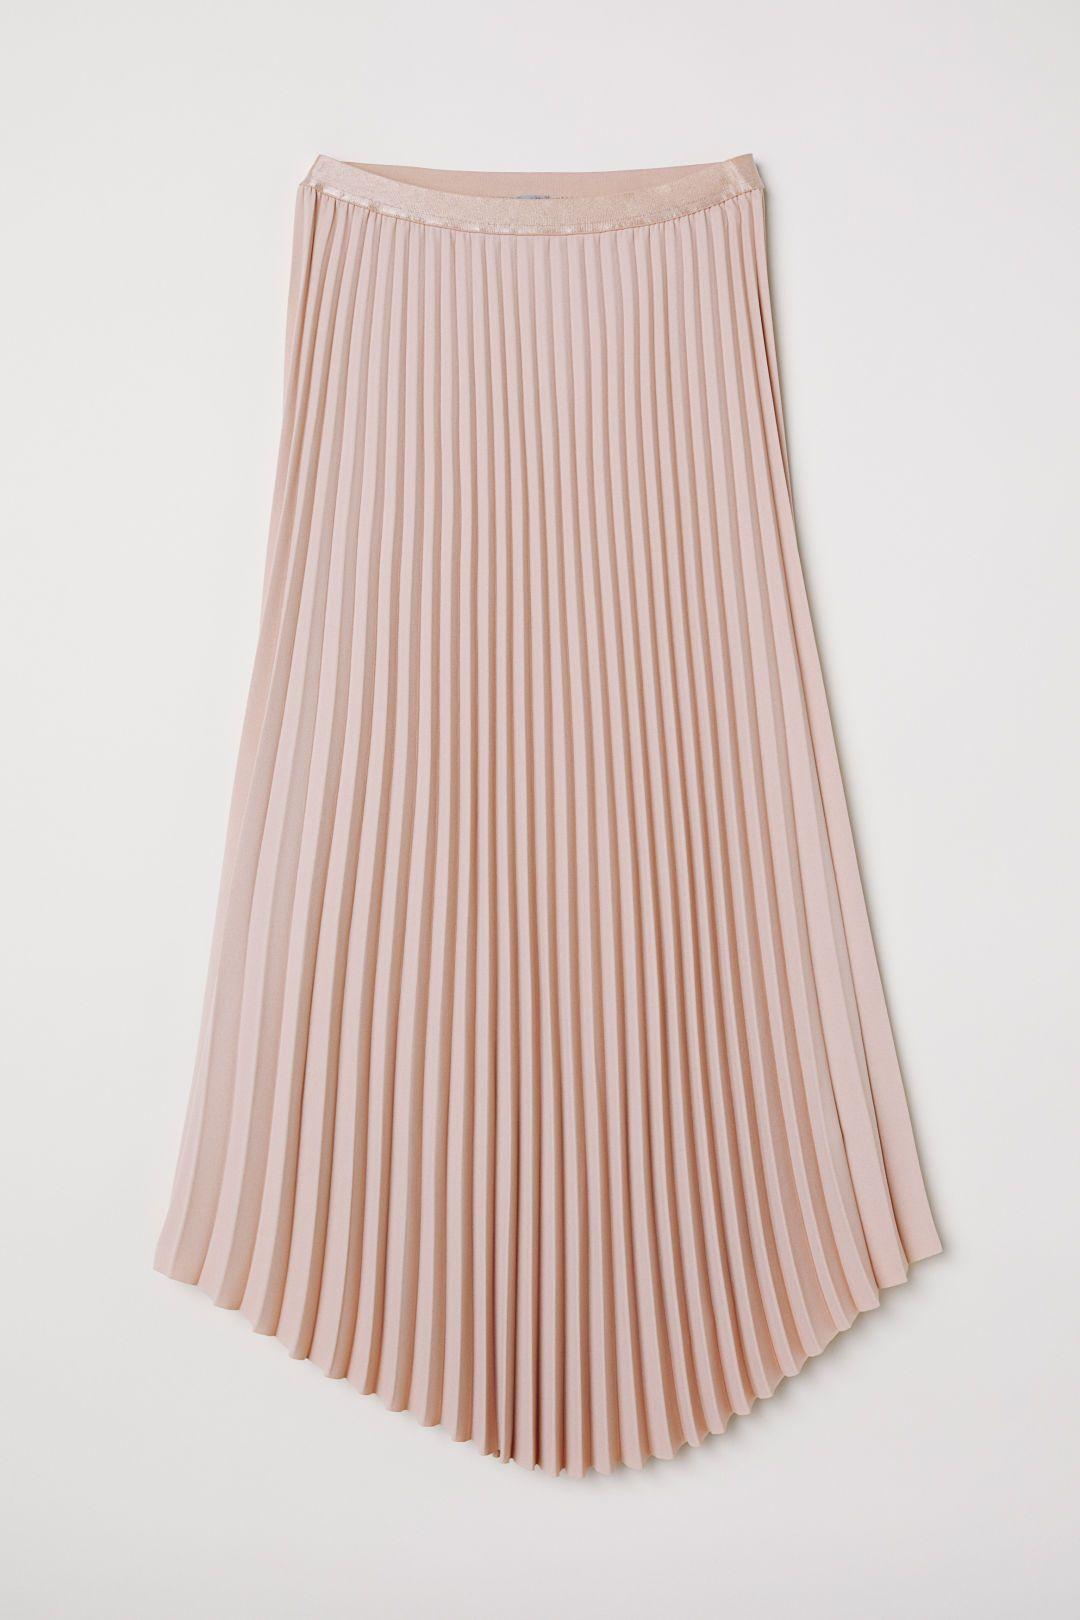 H&m pink pleated dress  Pleated Skirt  HuM  Pinterest  Skirts Pleated Skirt and Dressy